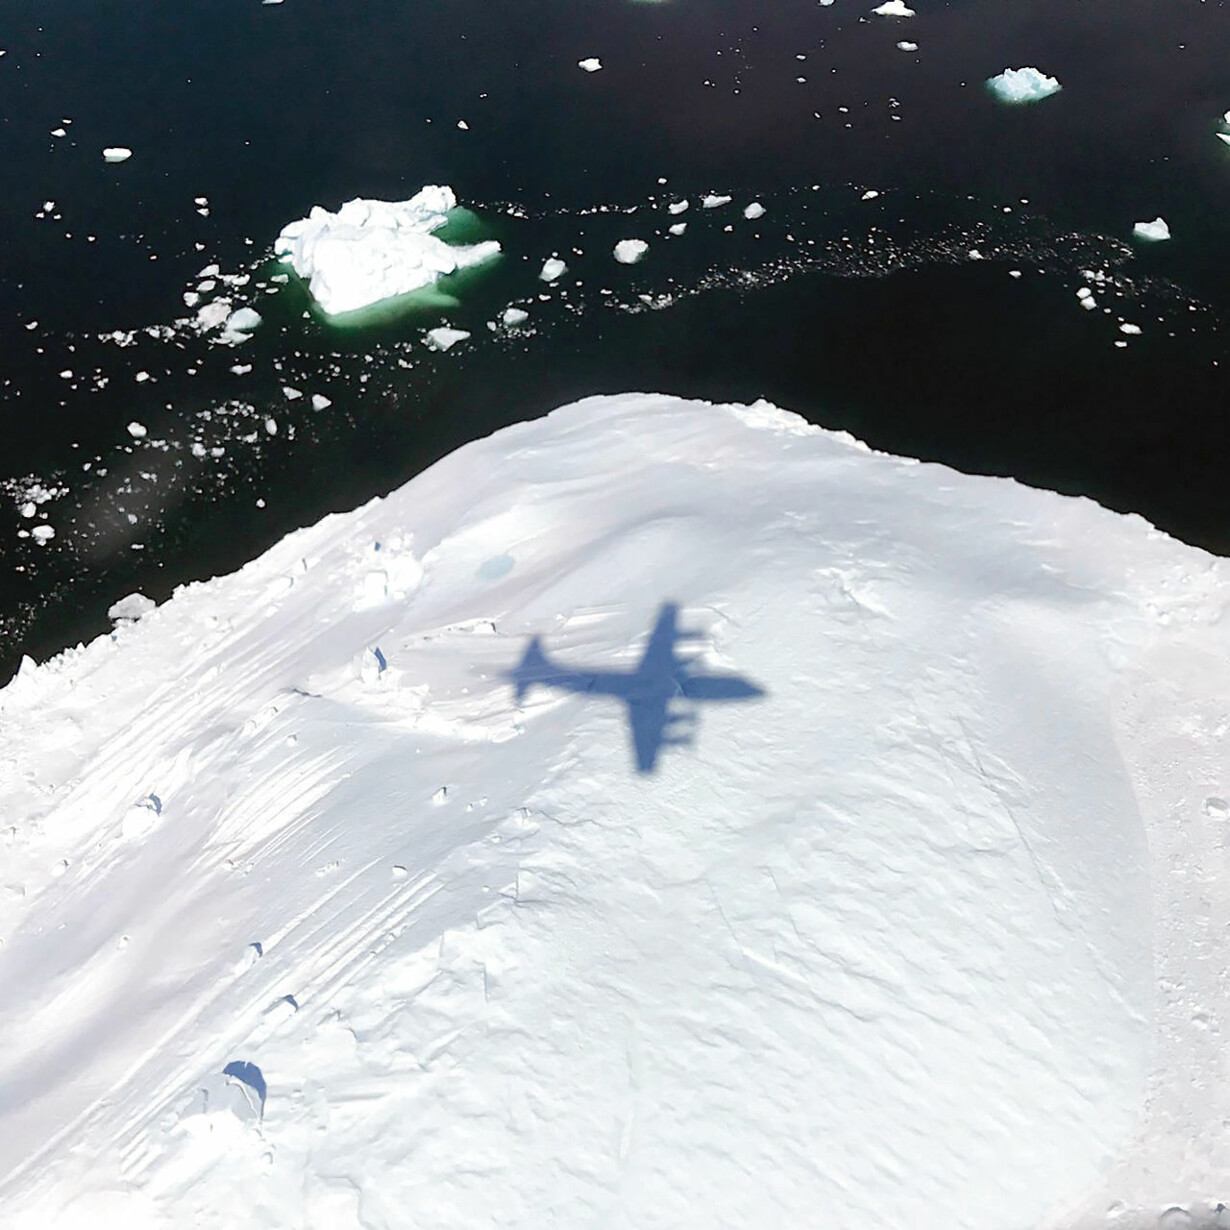 SPACE-GREENLAND-ICEBERG